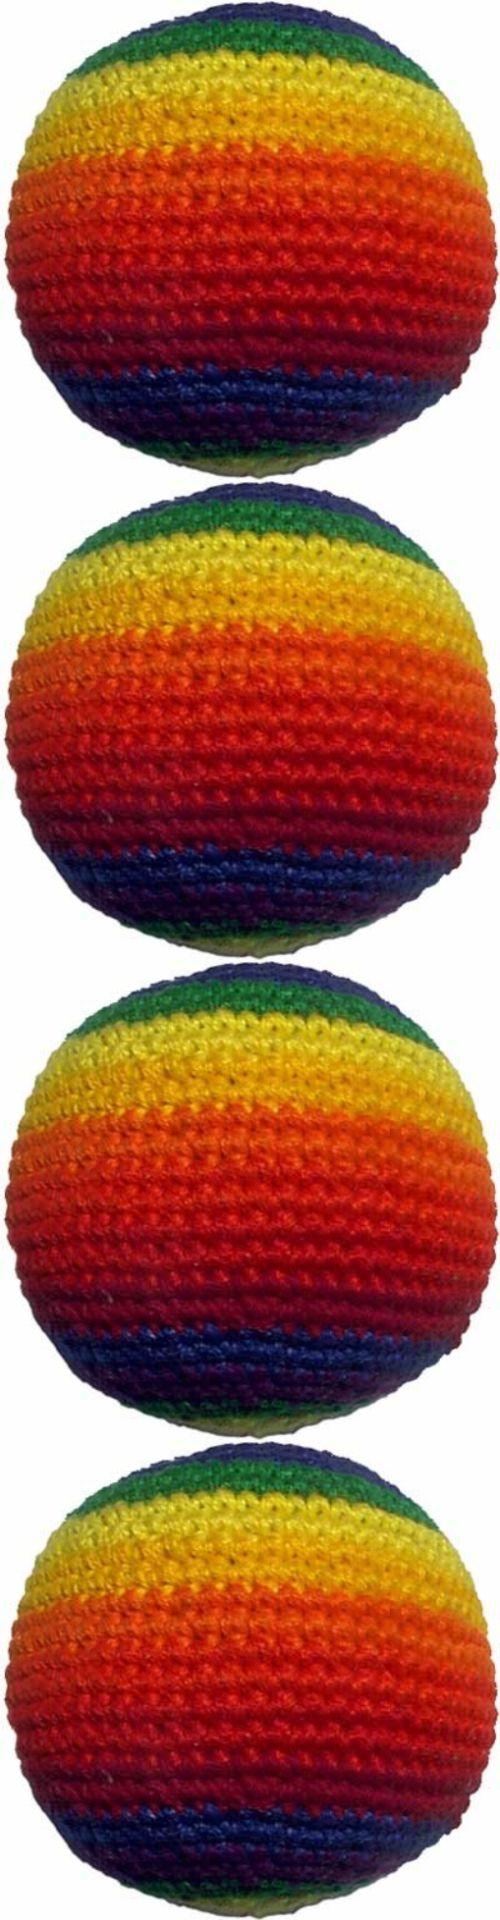 Balls Frisbees and Boomerangs 19017 Hacky Sack Rainbow